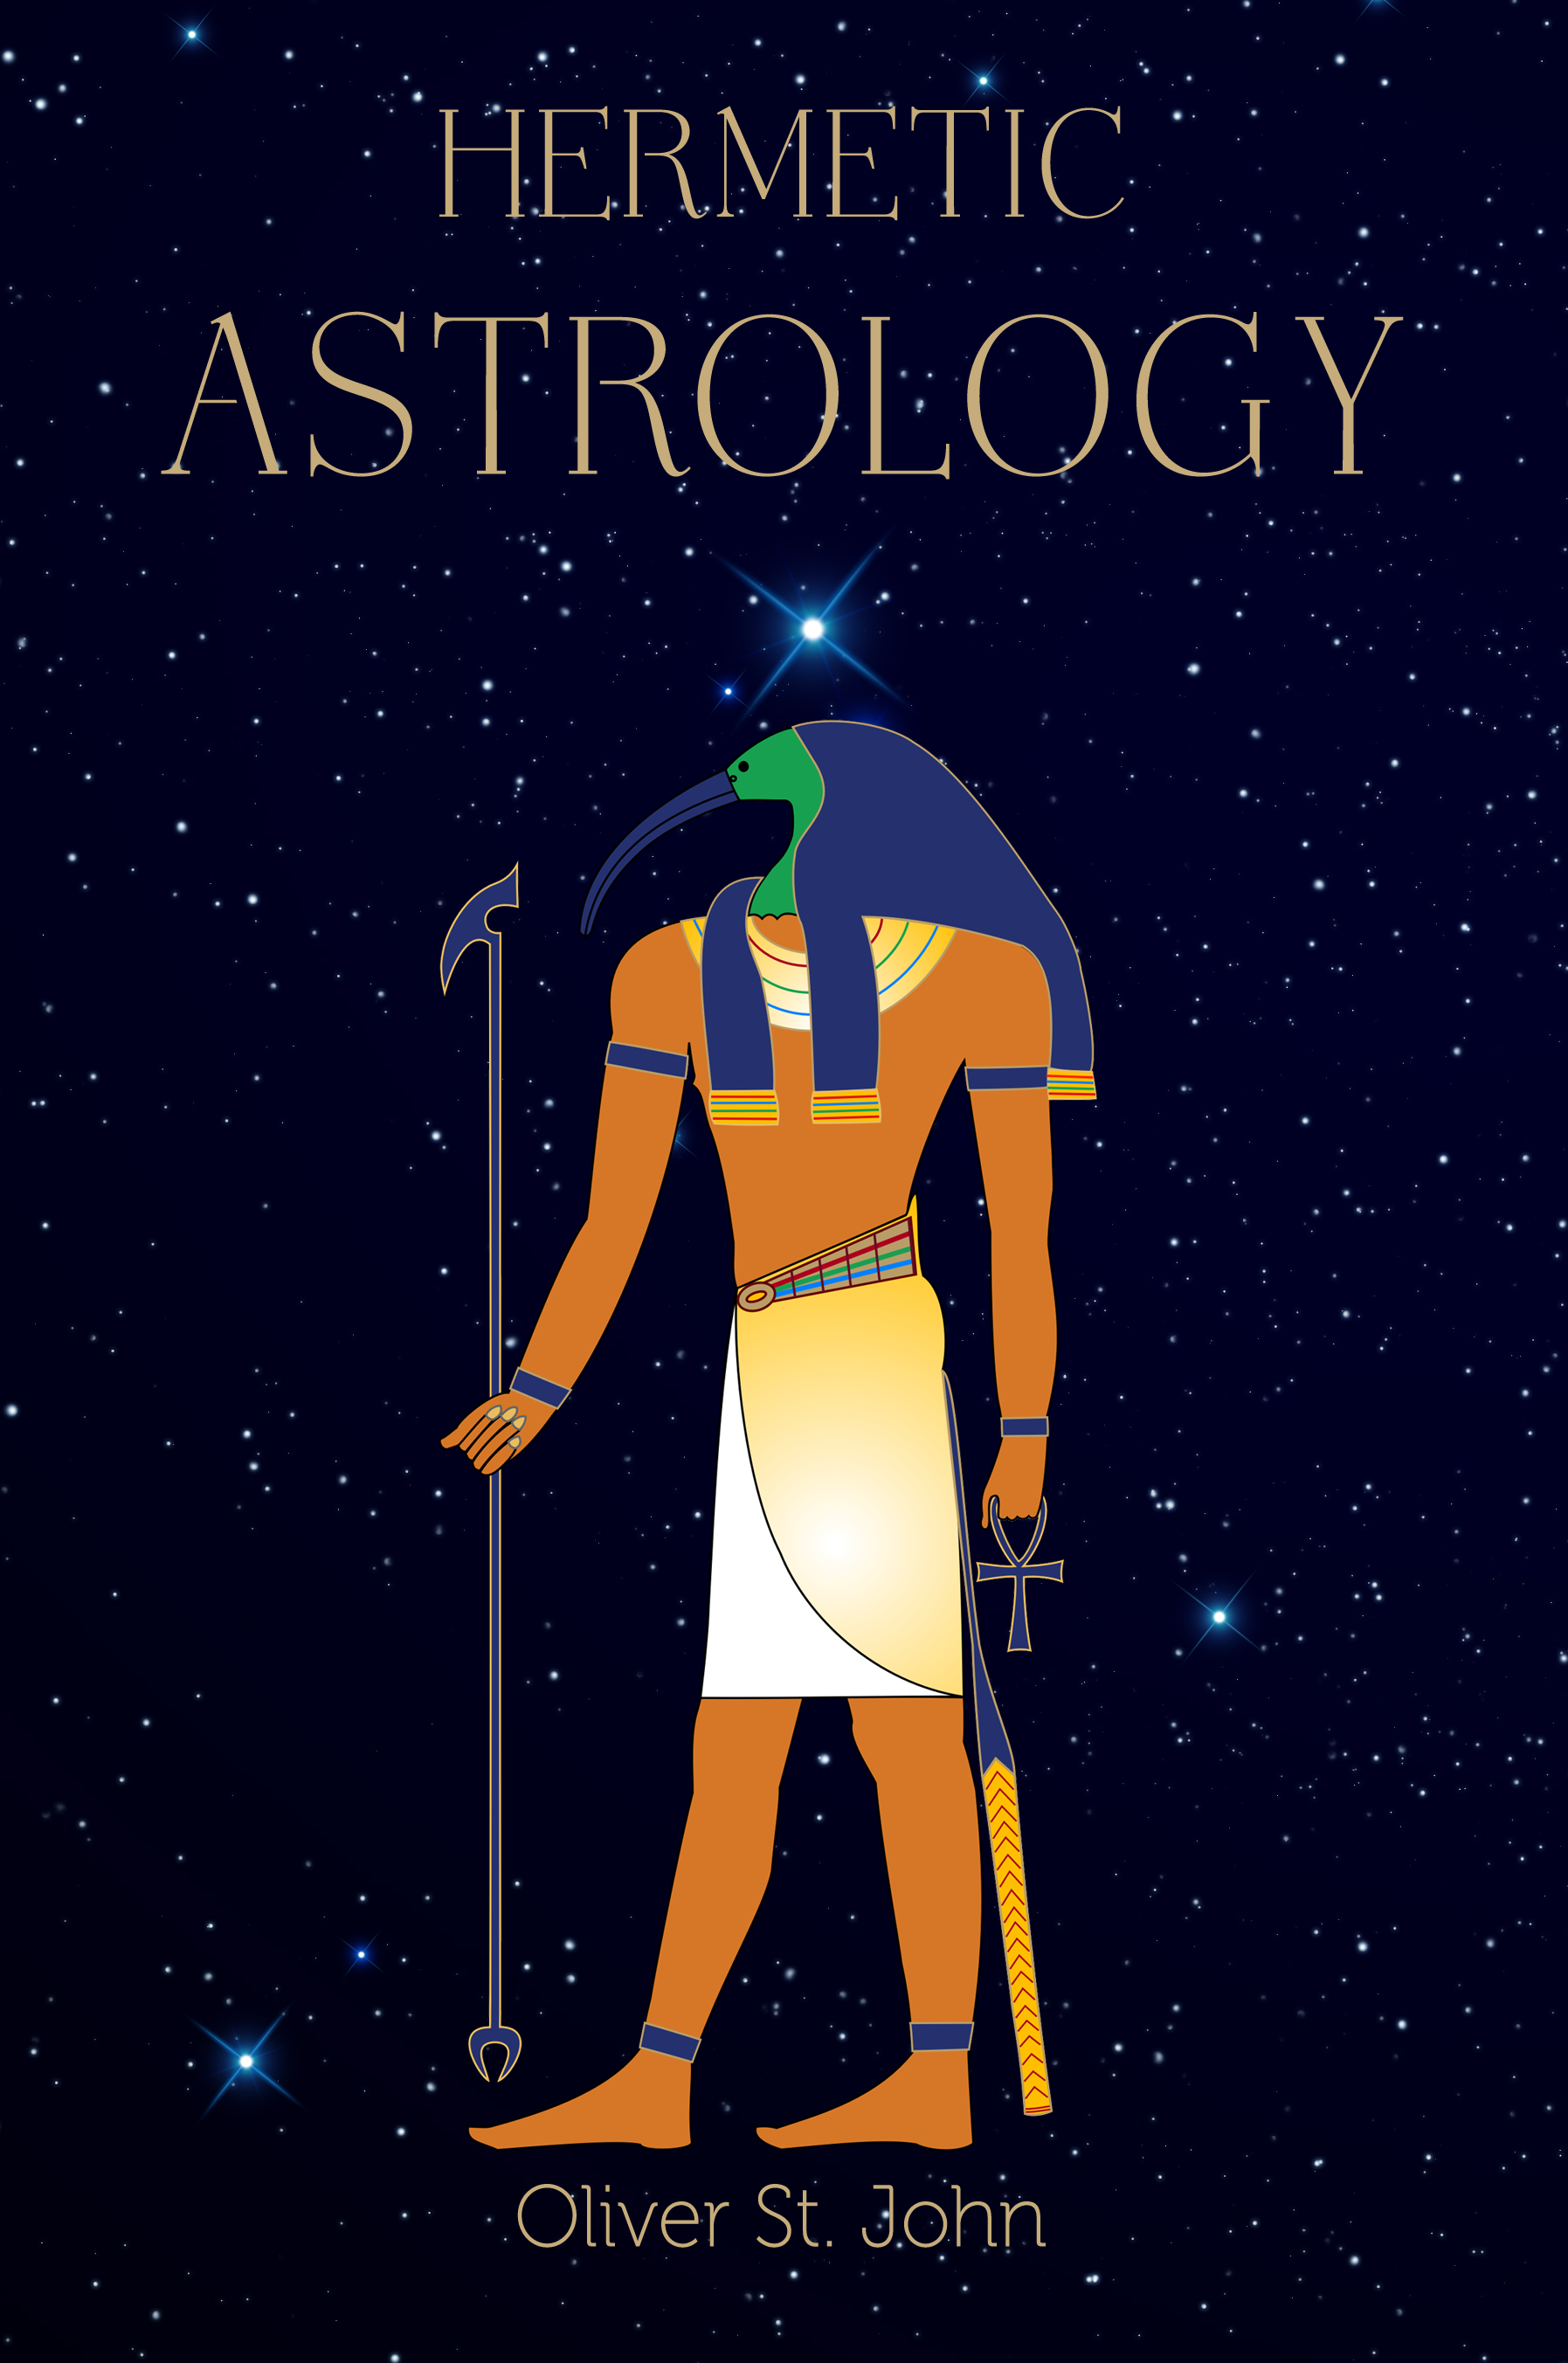 Hermetic Astrology Cover Art